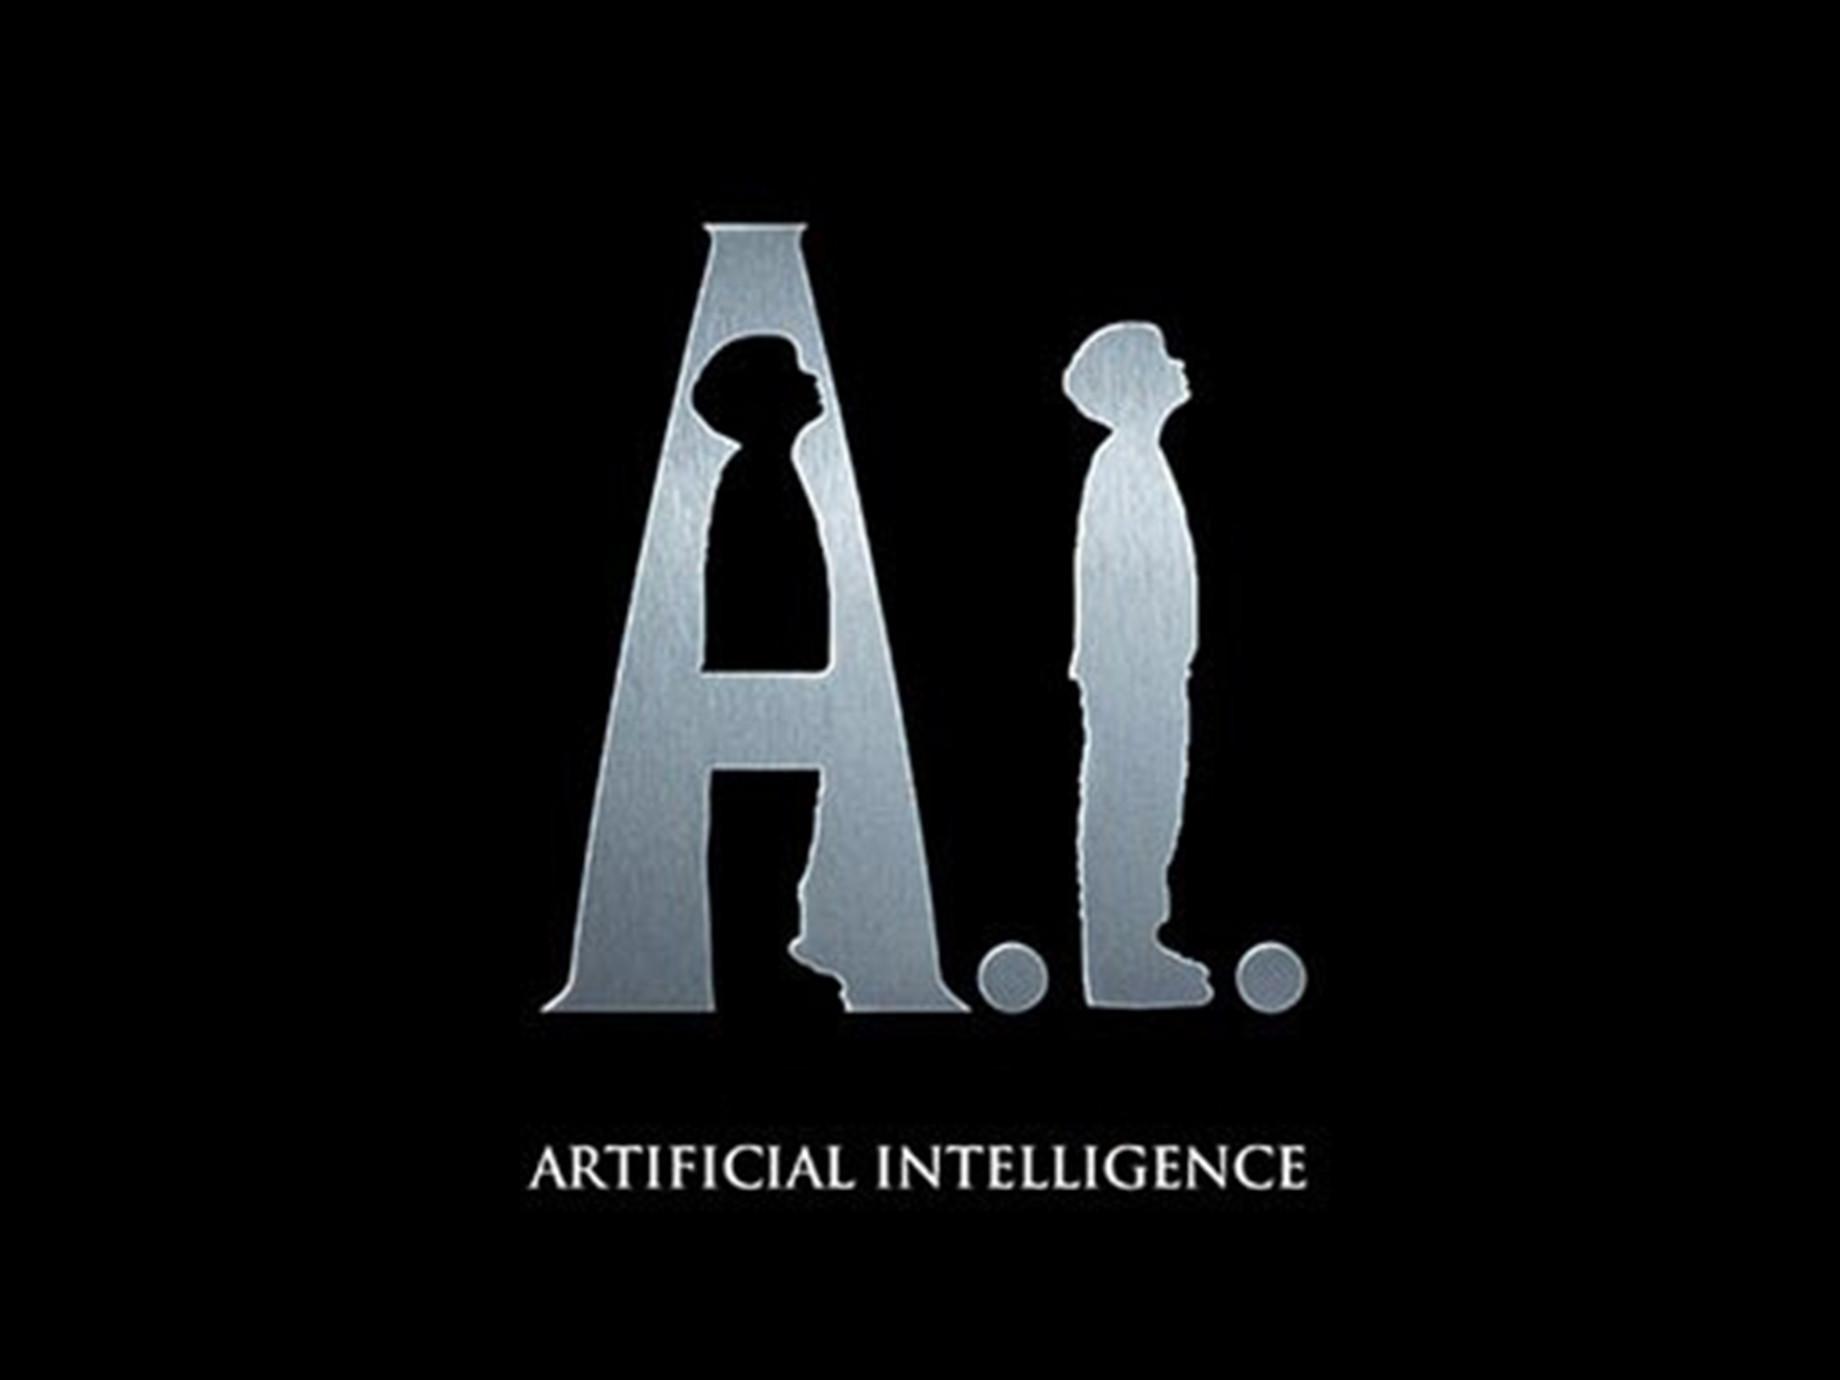 SAS:人工智慧5年內需求在「大A小I」